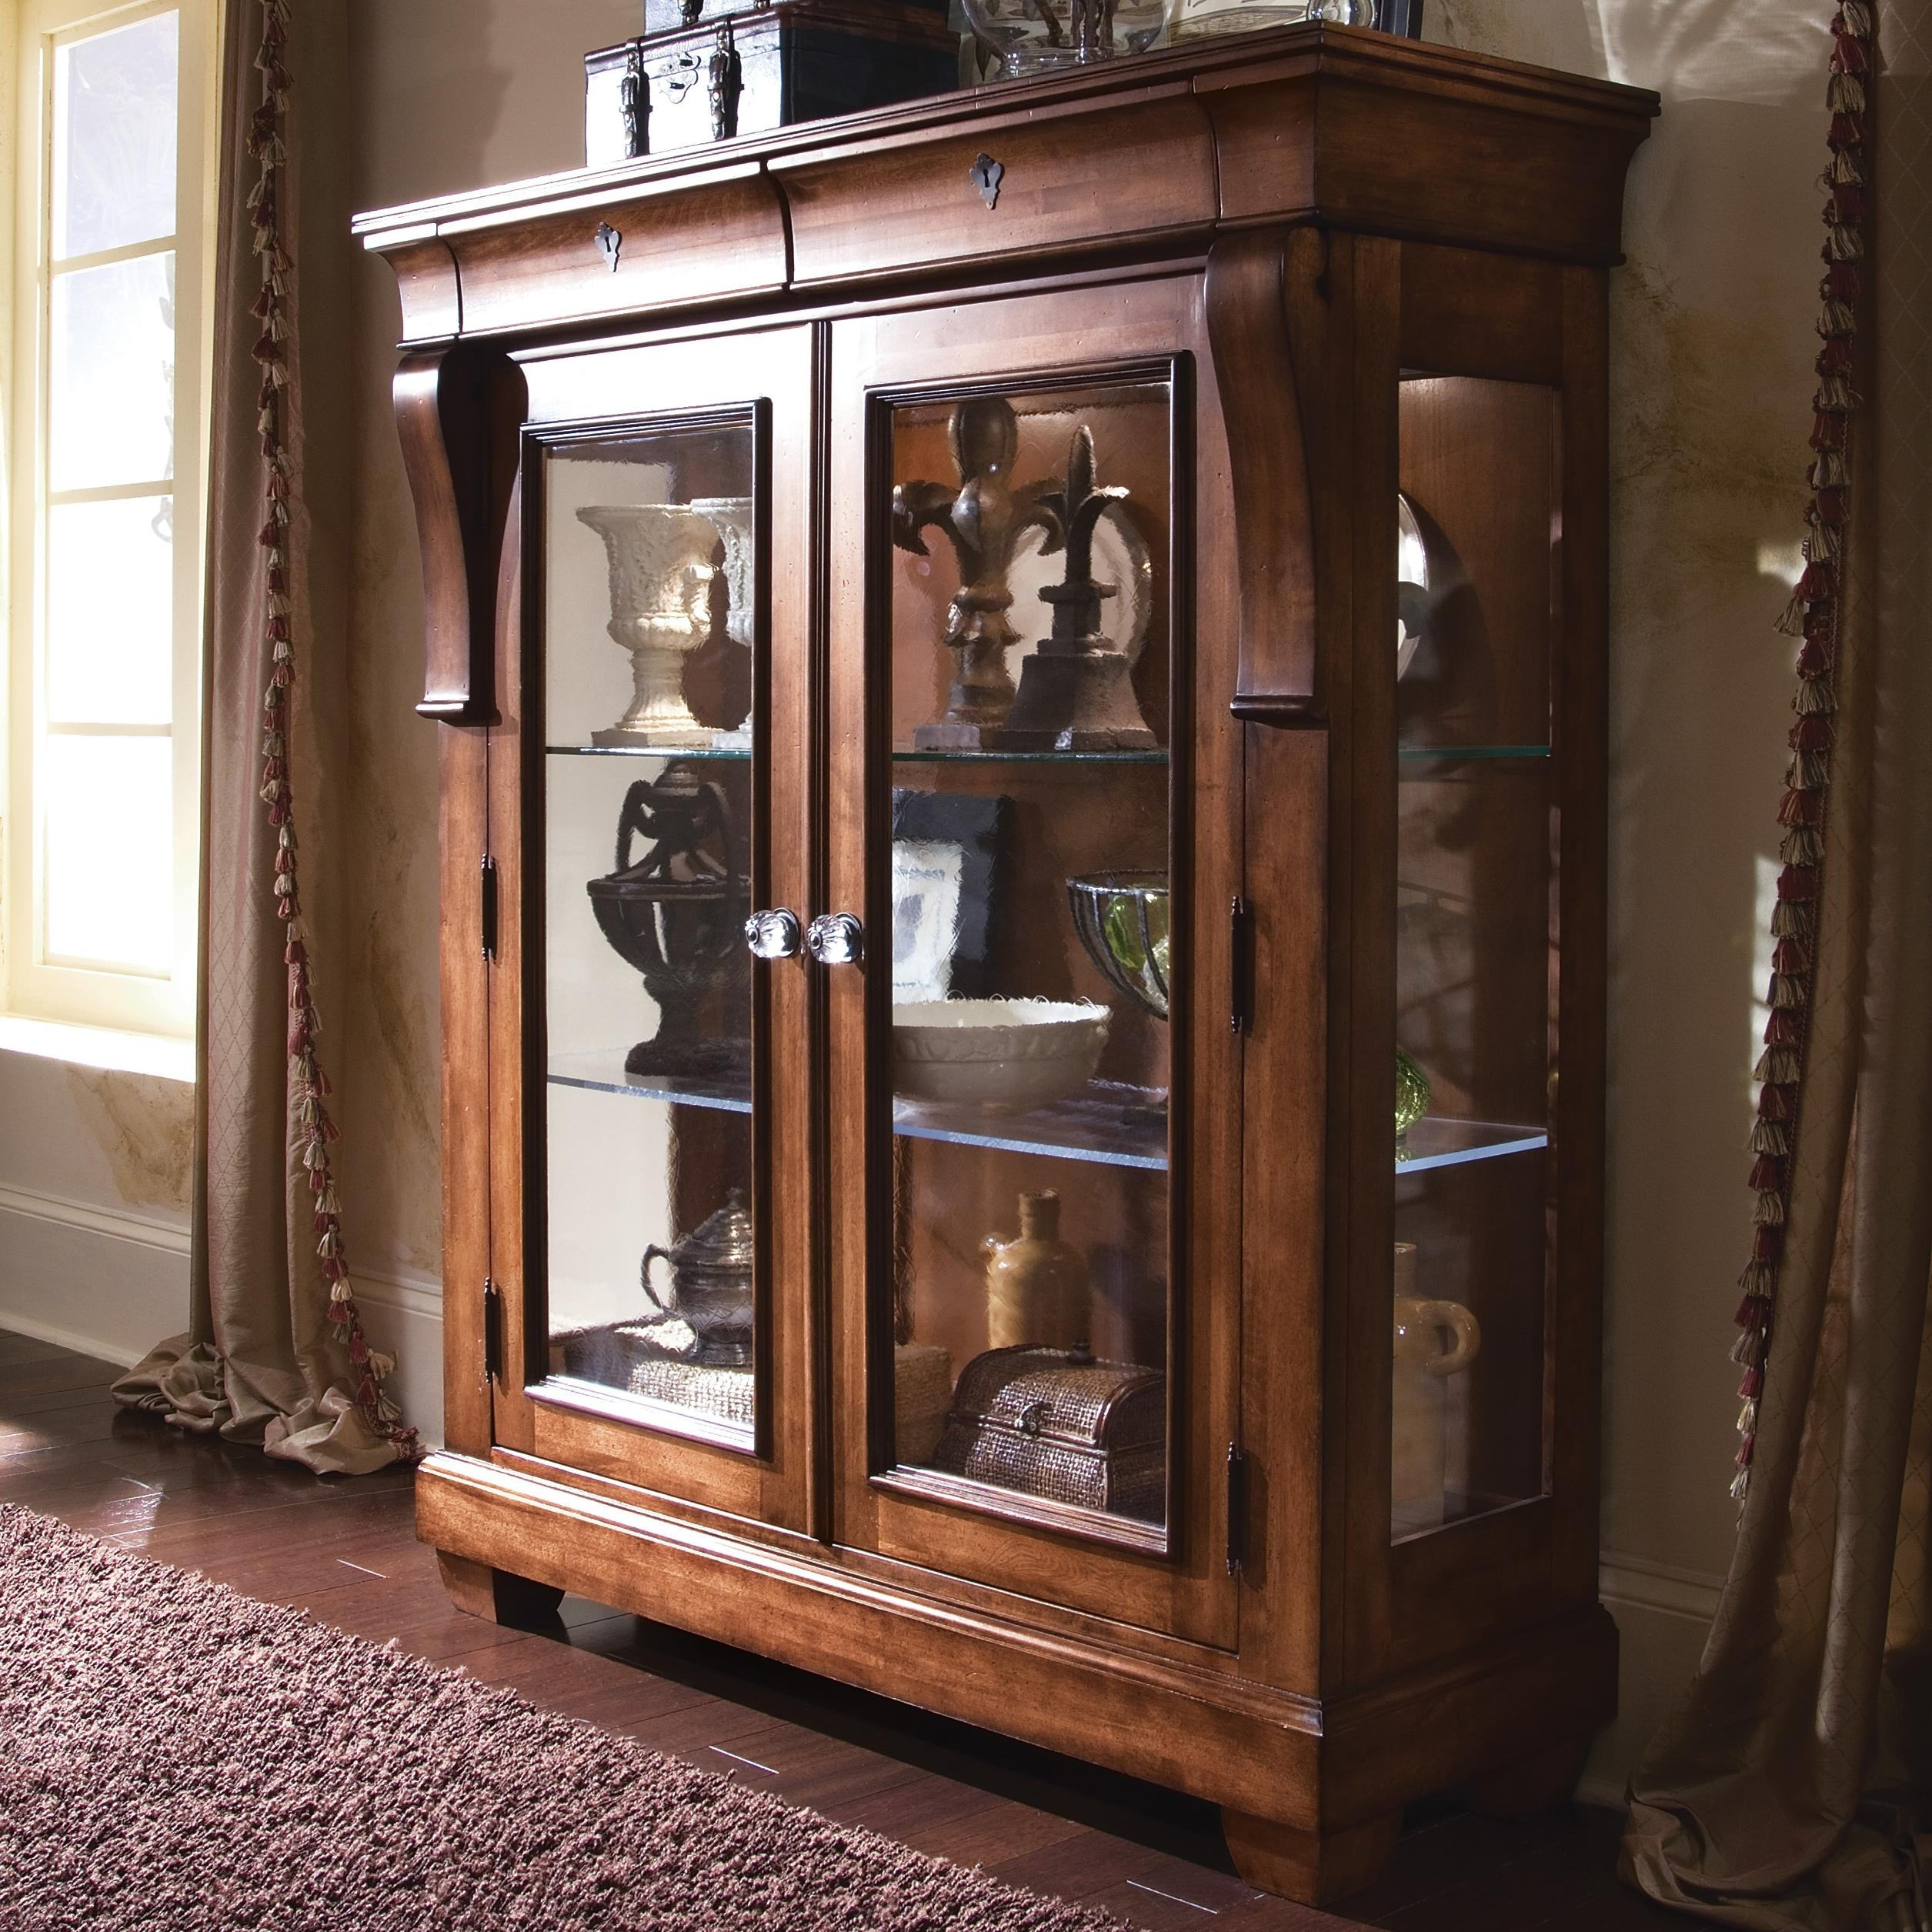 Madison Art Center Design: Display Cabinet Sliding Glass Door Hardware